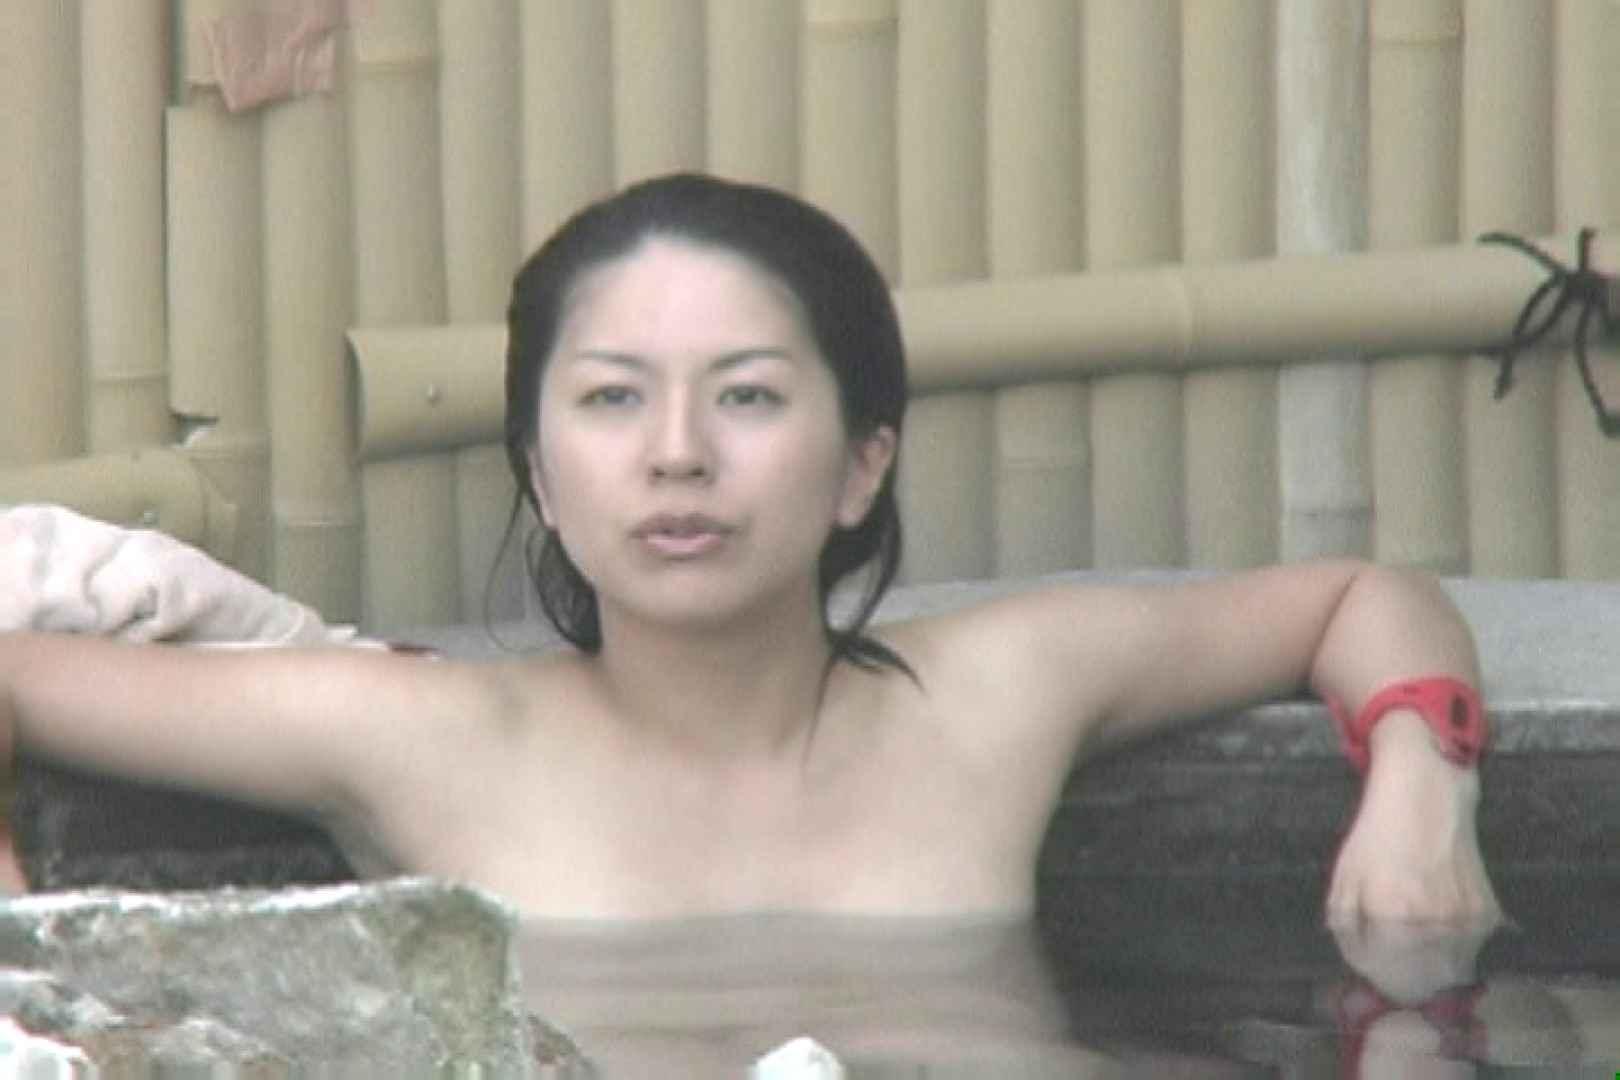 Aquaな露天風呂Vol.694 露天 オメコ無修正動画無料 110PICs 65